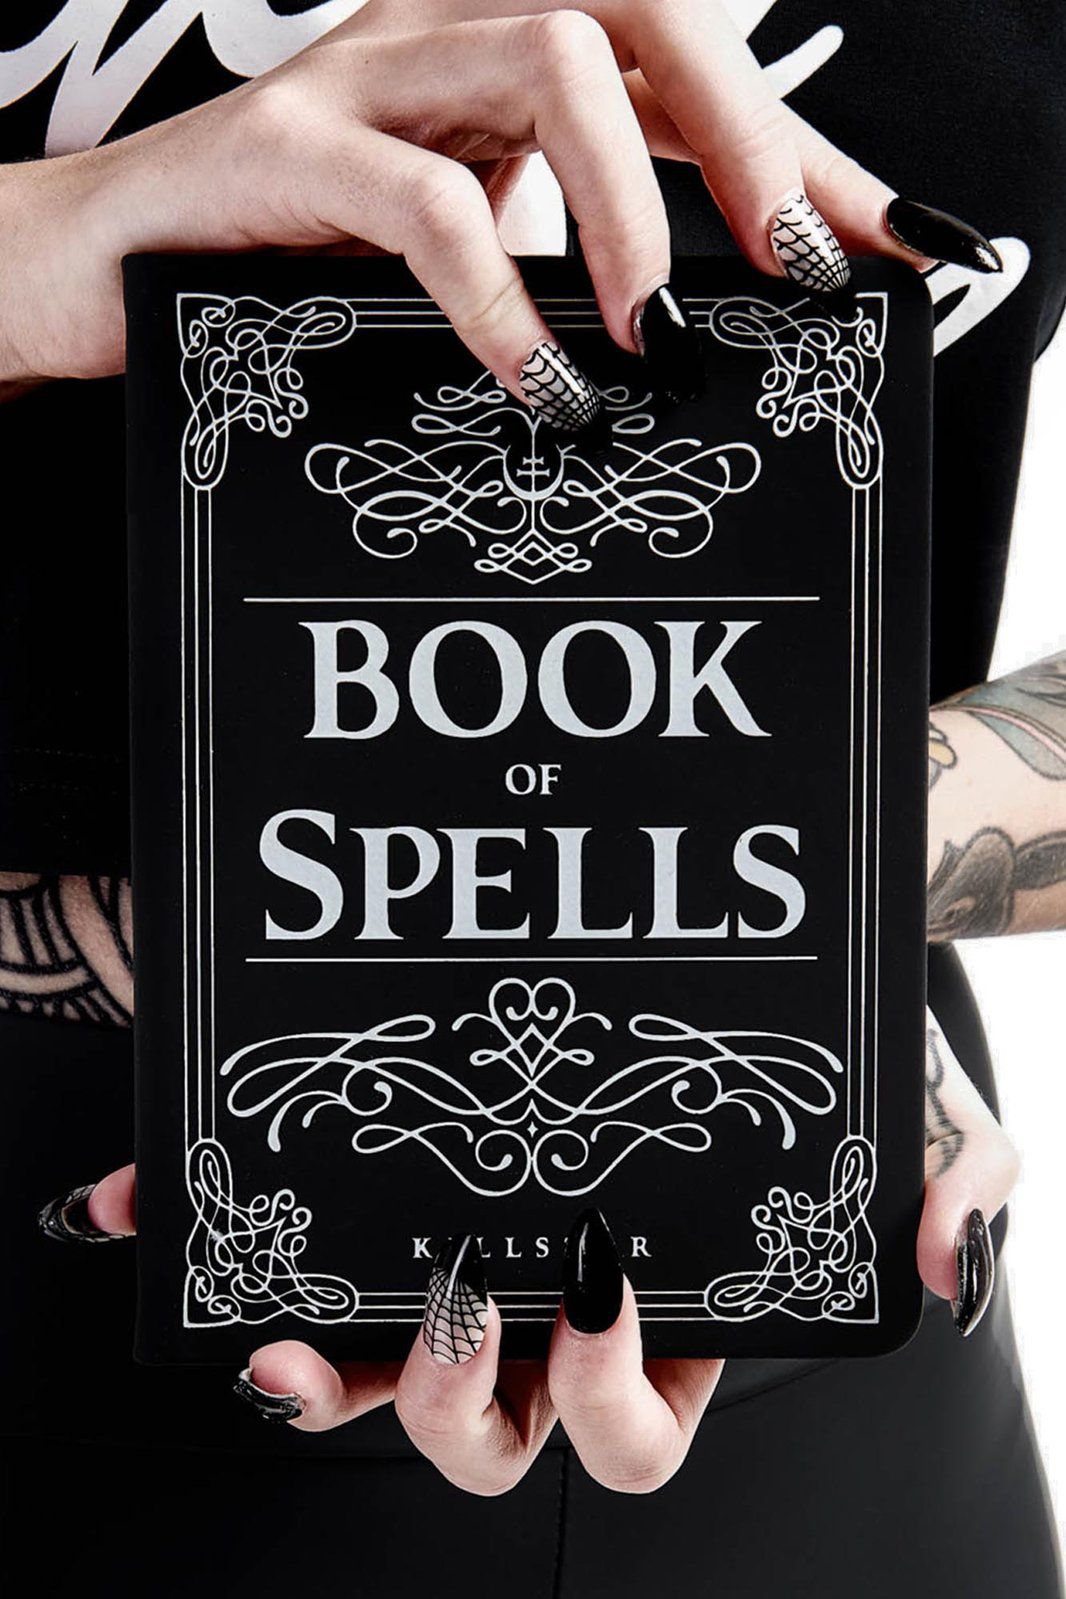 KS02600_carnet-bloc-note-journal-gothique-rock-book-of-spells